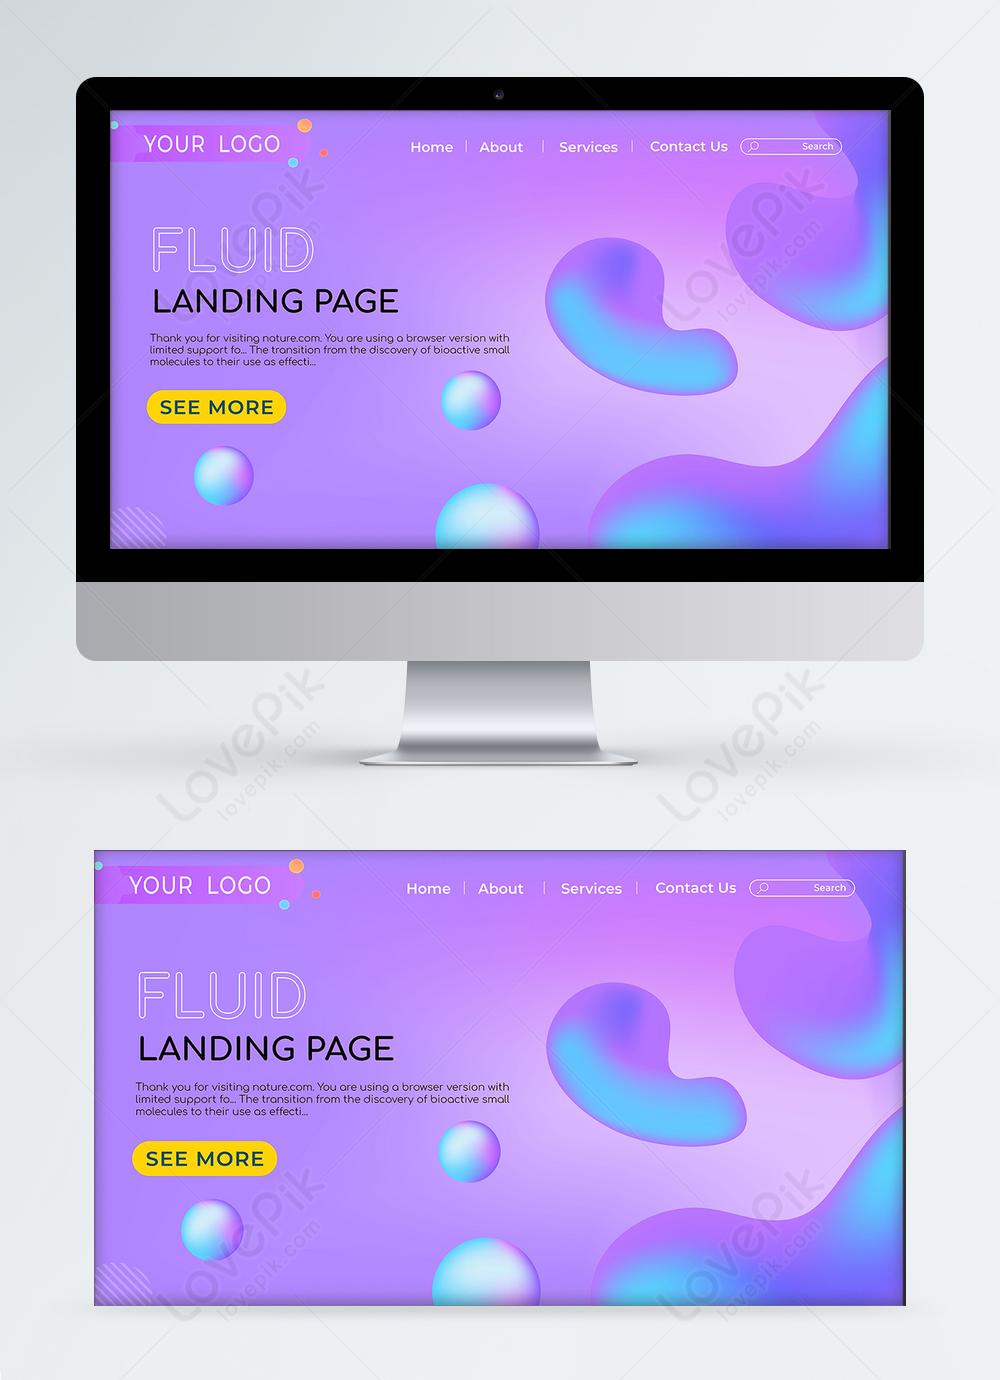 Purple Fluid Elements Landing Page Ui Design Template Image Picture Free Download 465500969 Lovepik Com